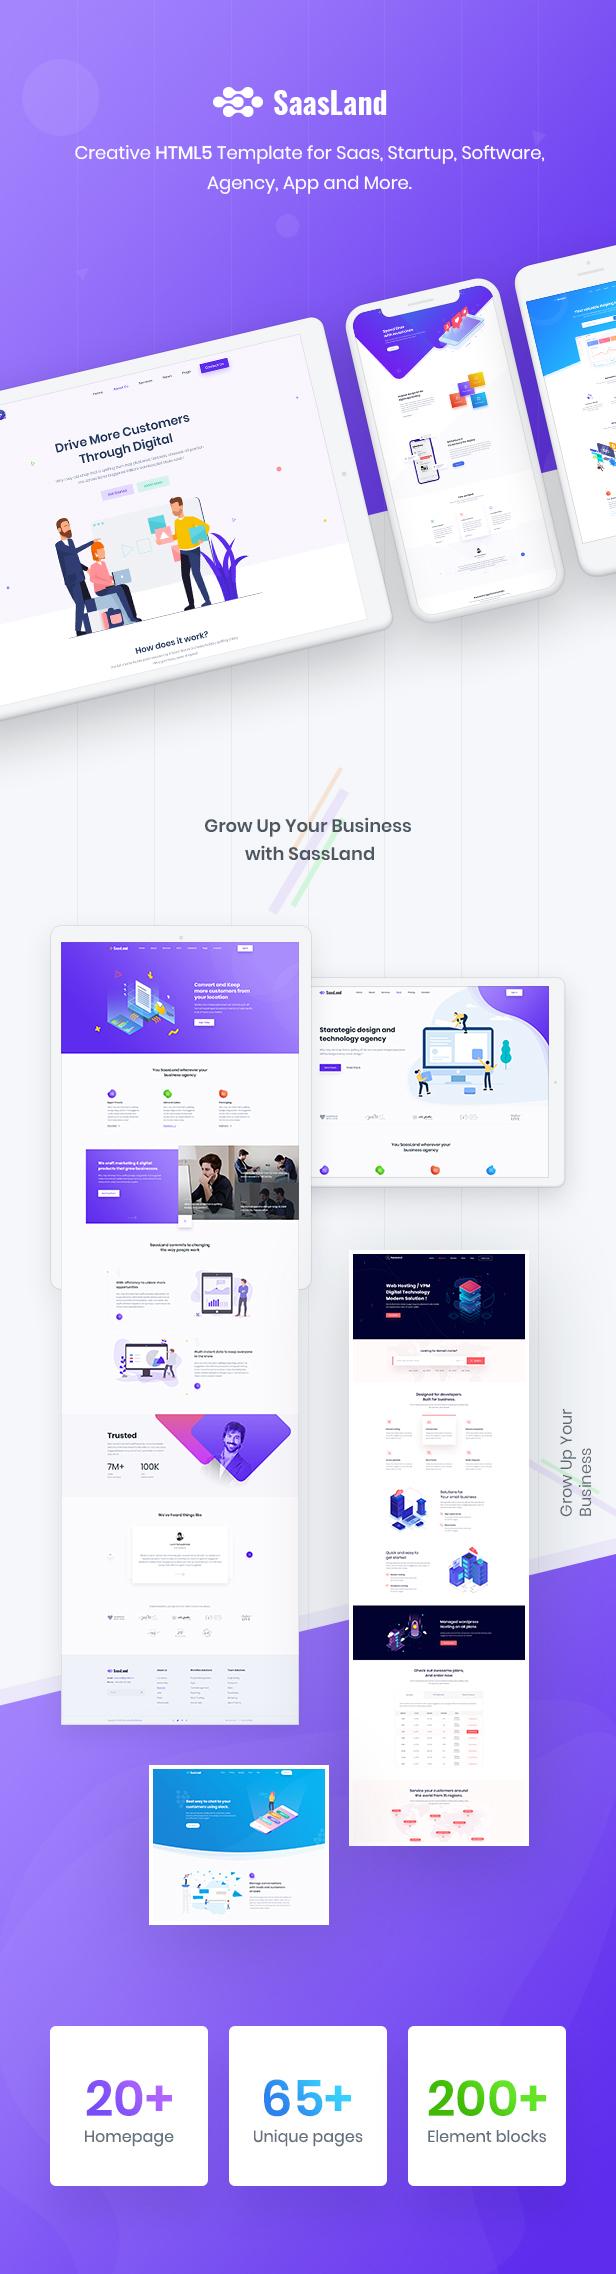 01 2 - SaasLand - Creative HTML5 Template for Saas, Startup & Agency